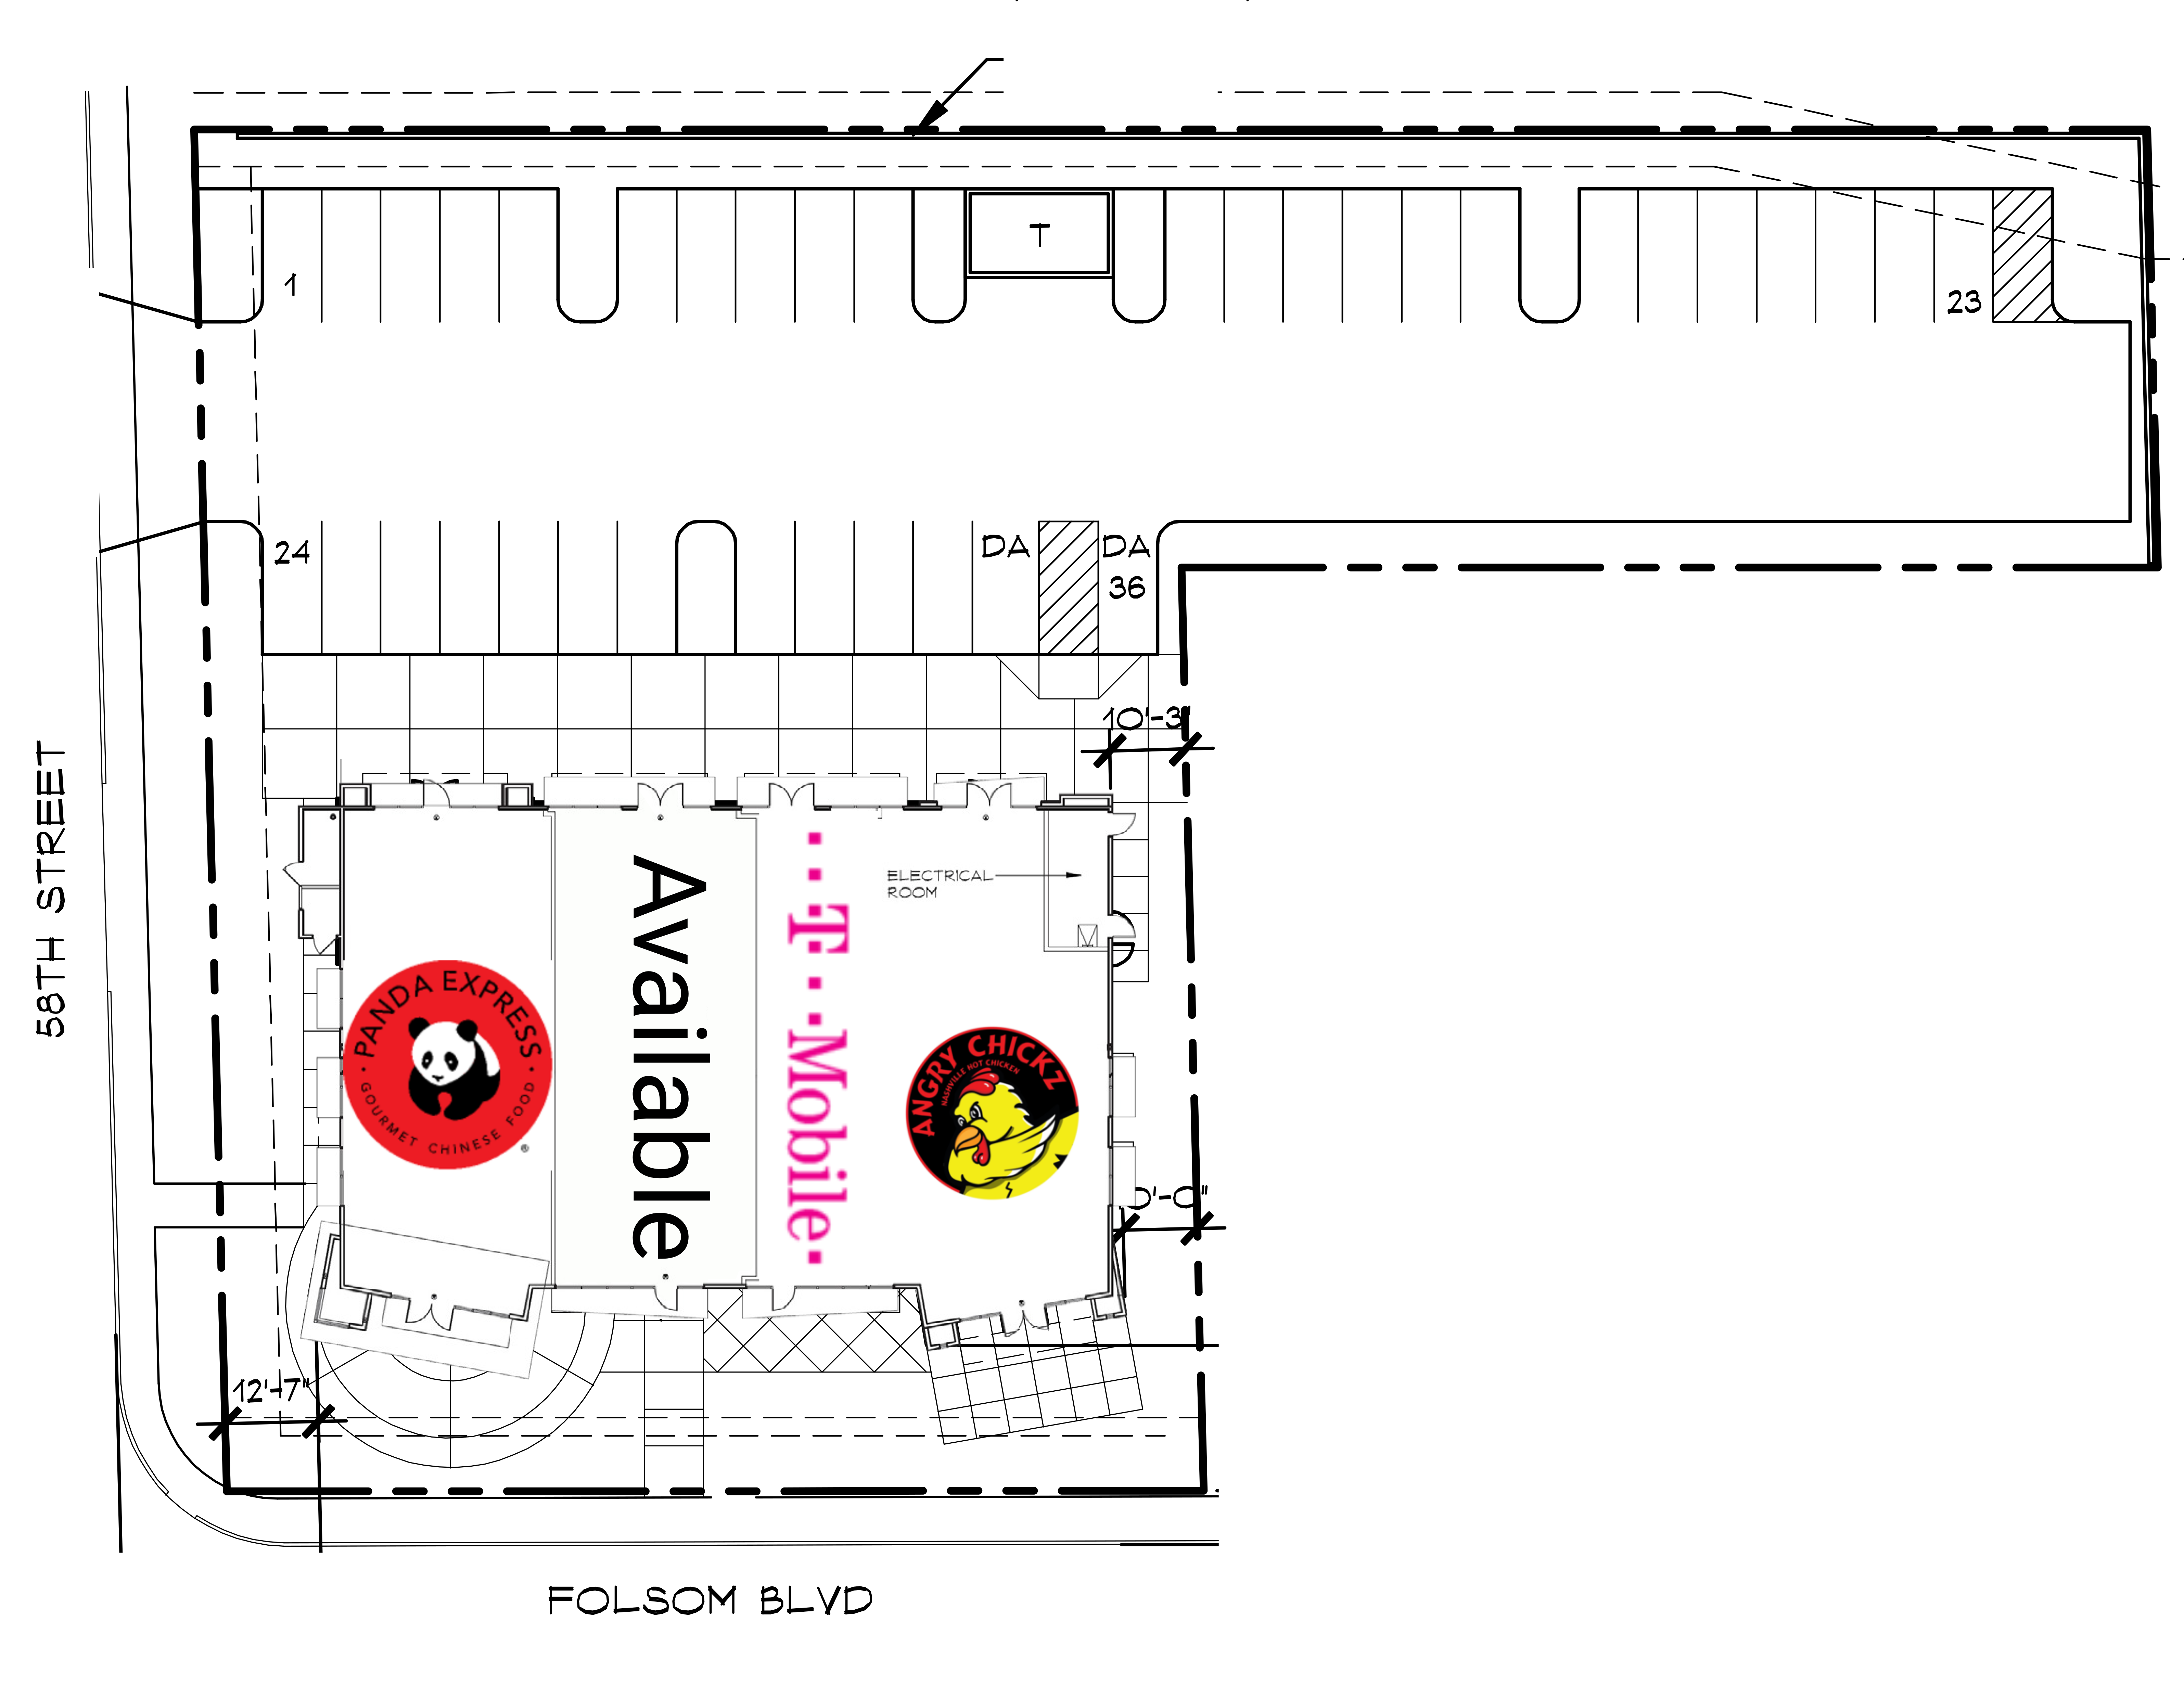 East Sacramento Shops: site plan